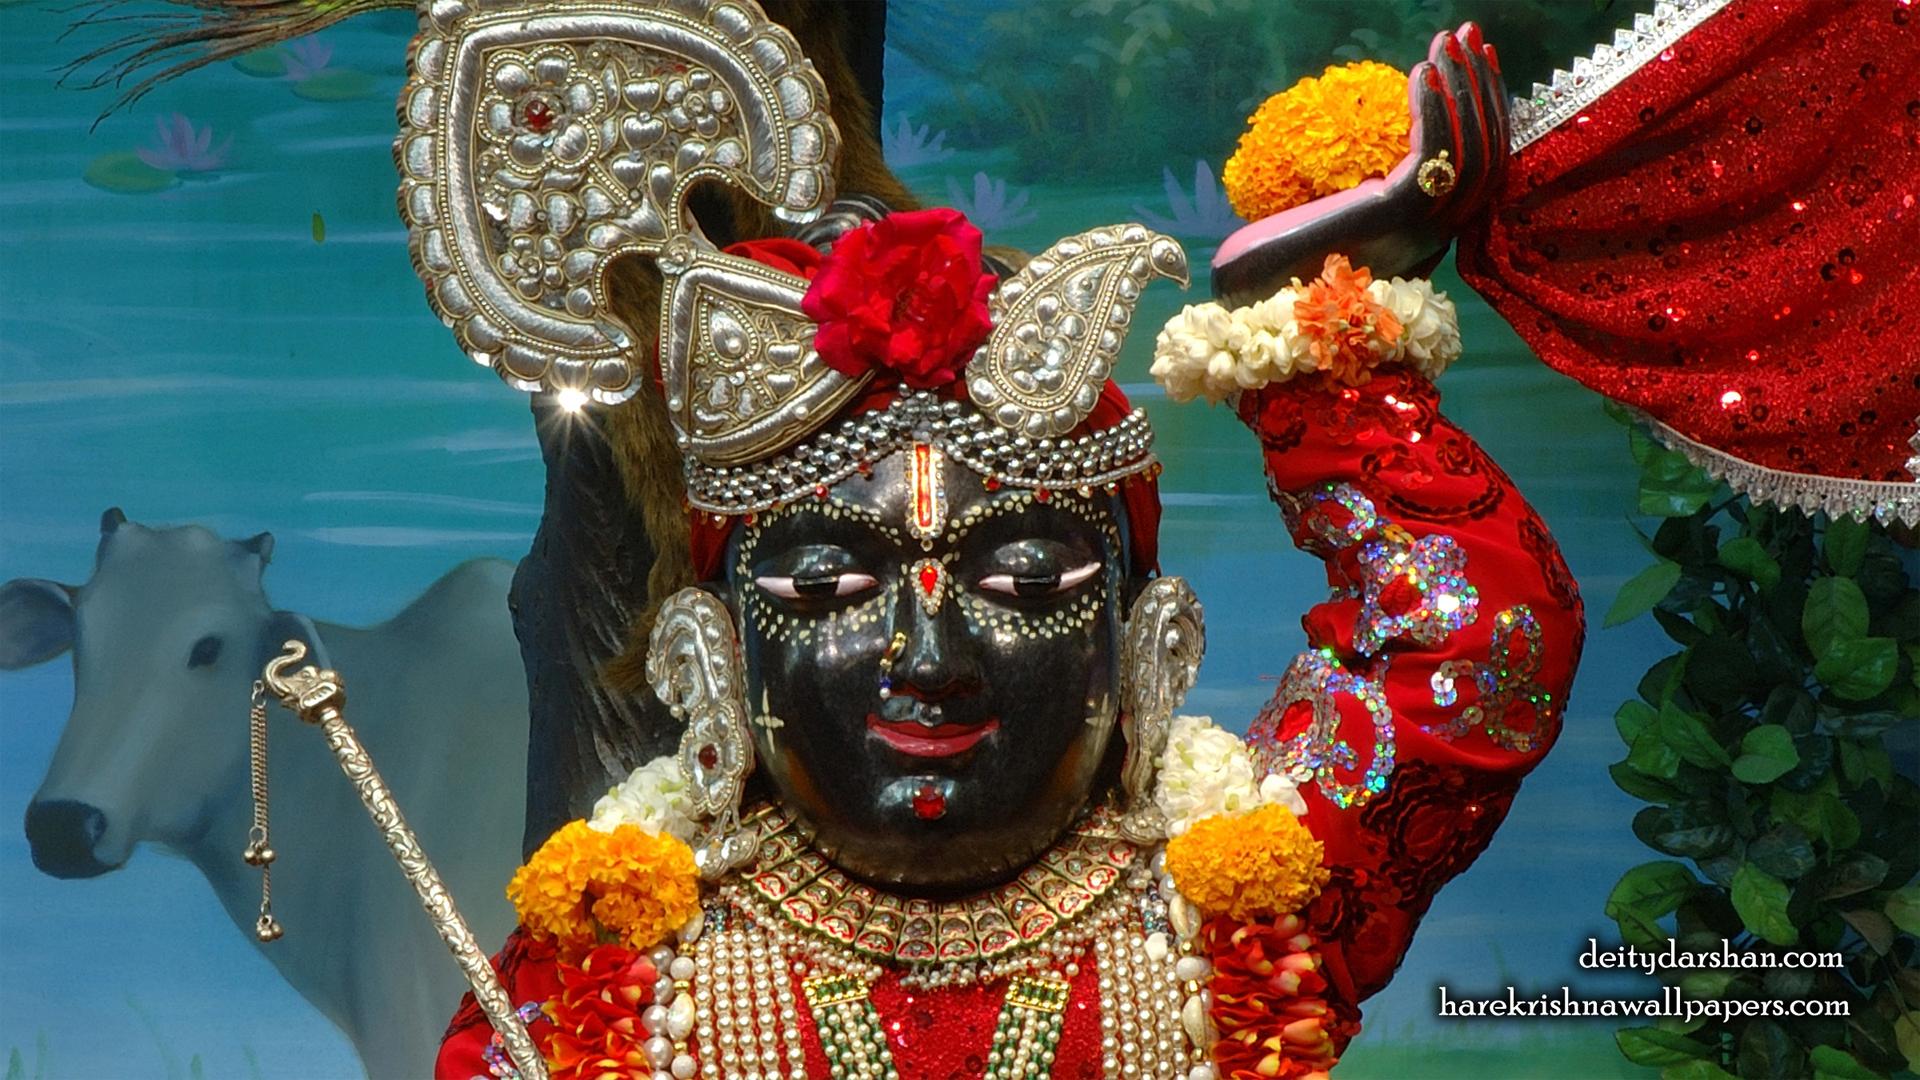 Sri Gopal Close up Wallpaper (053) Size 1920x1080 Download